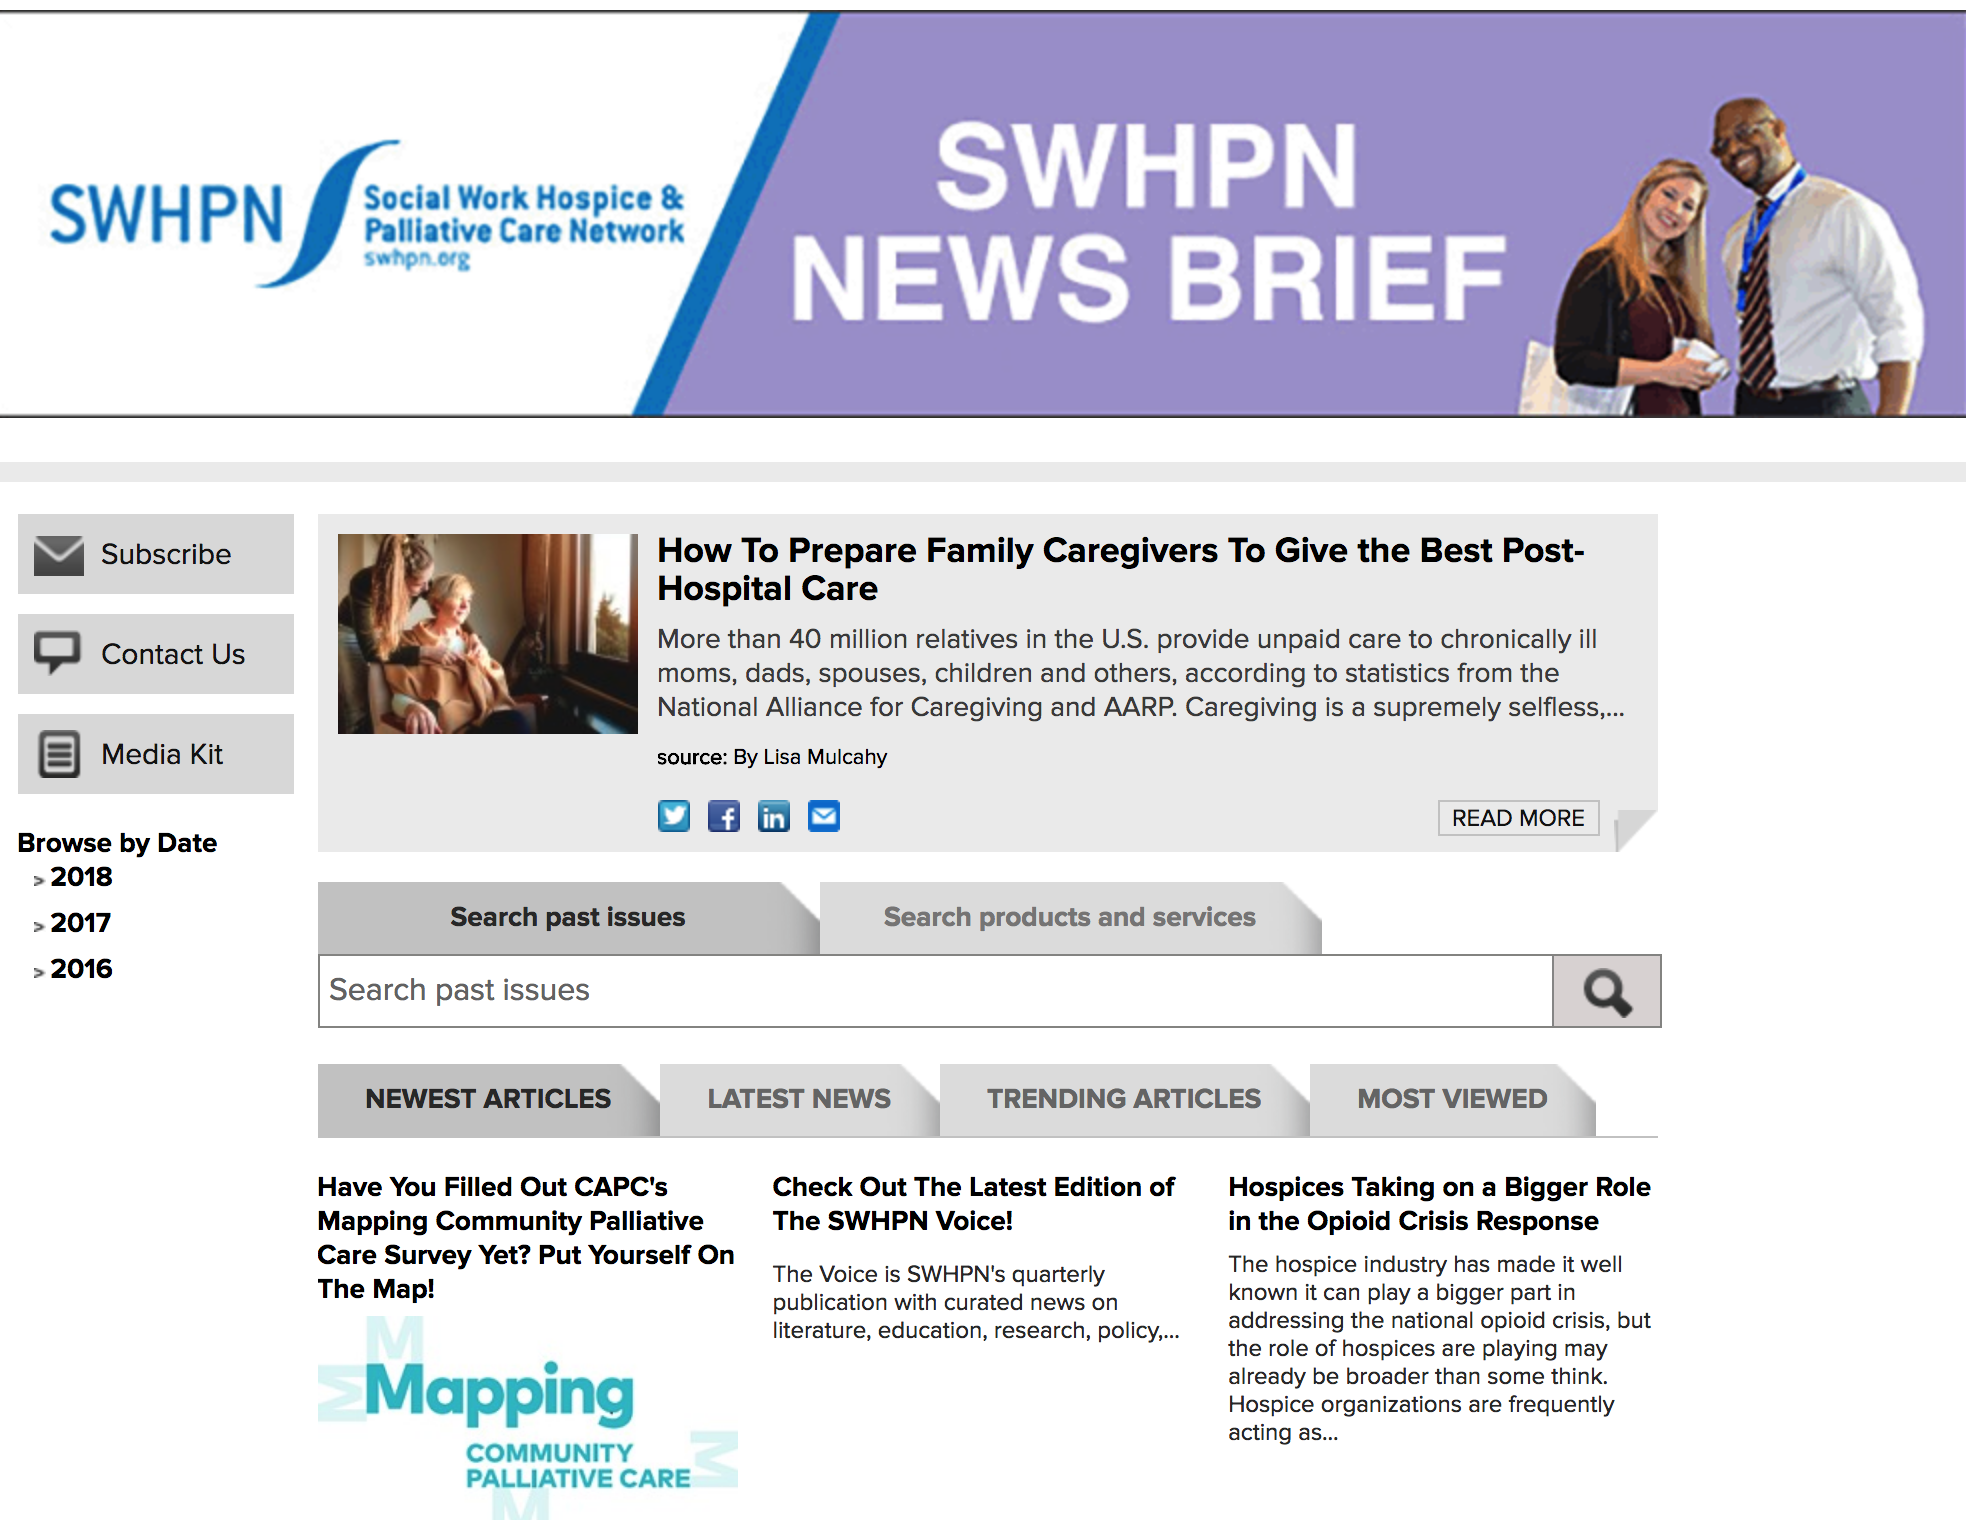 SWHPN News Brief